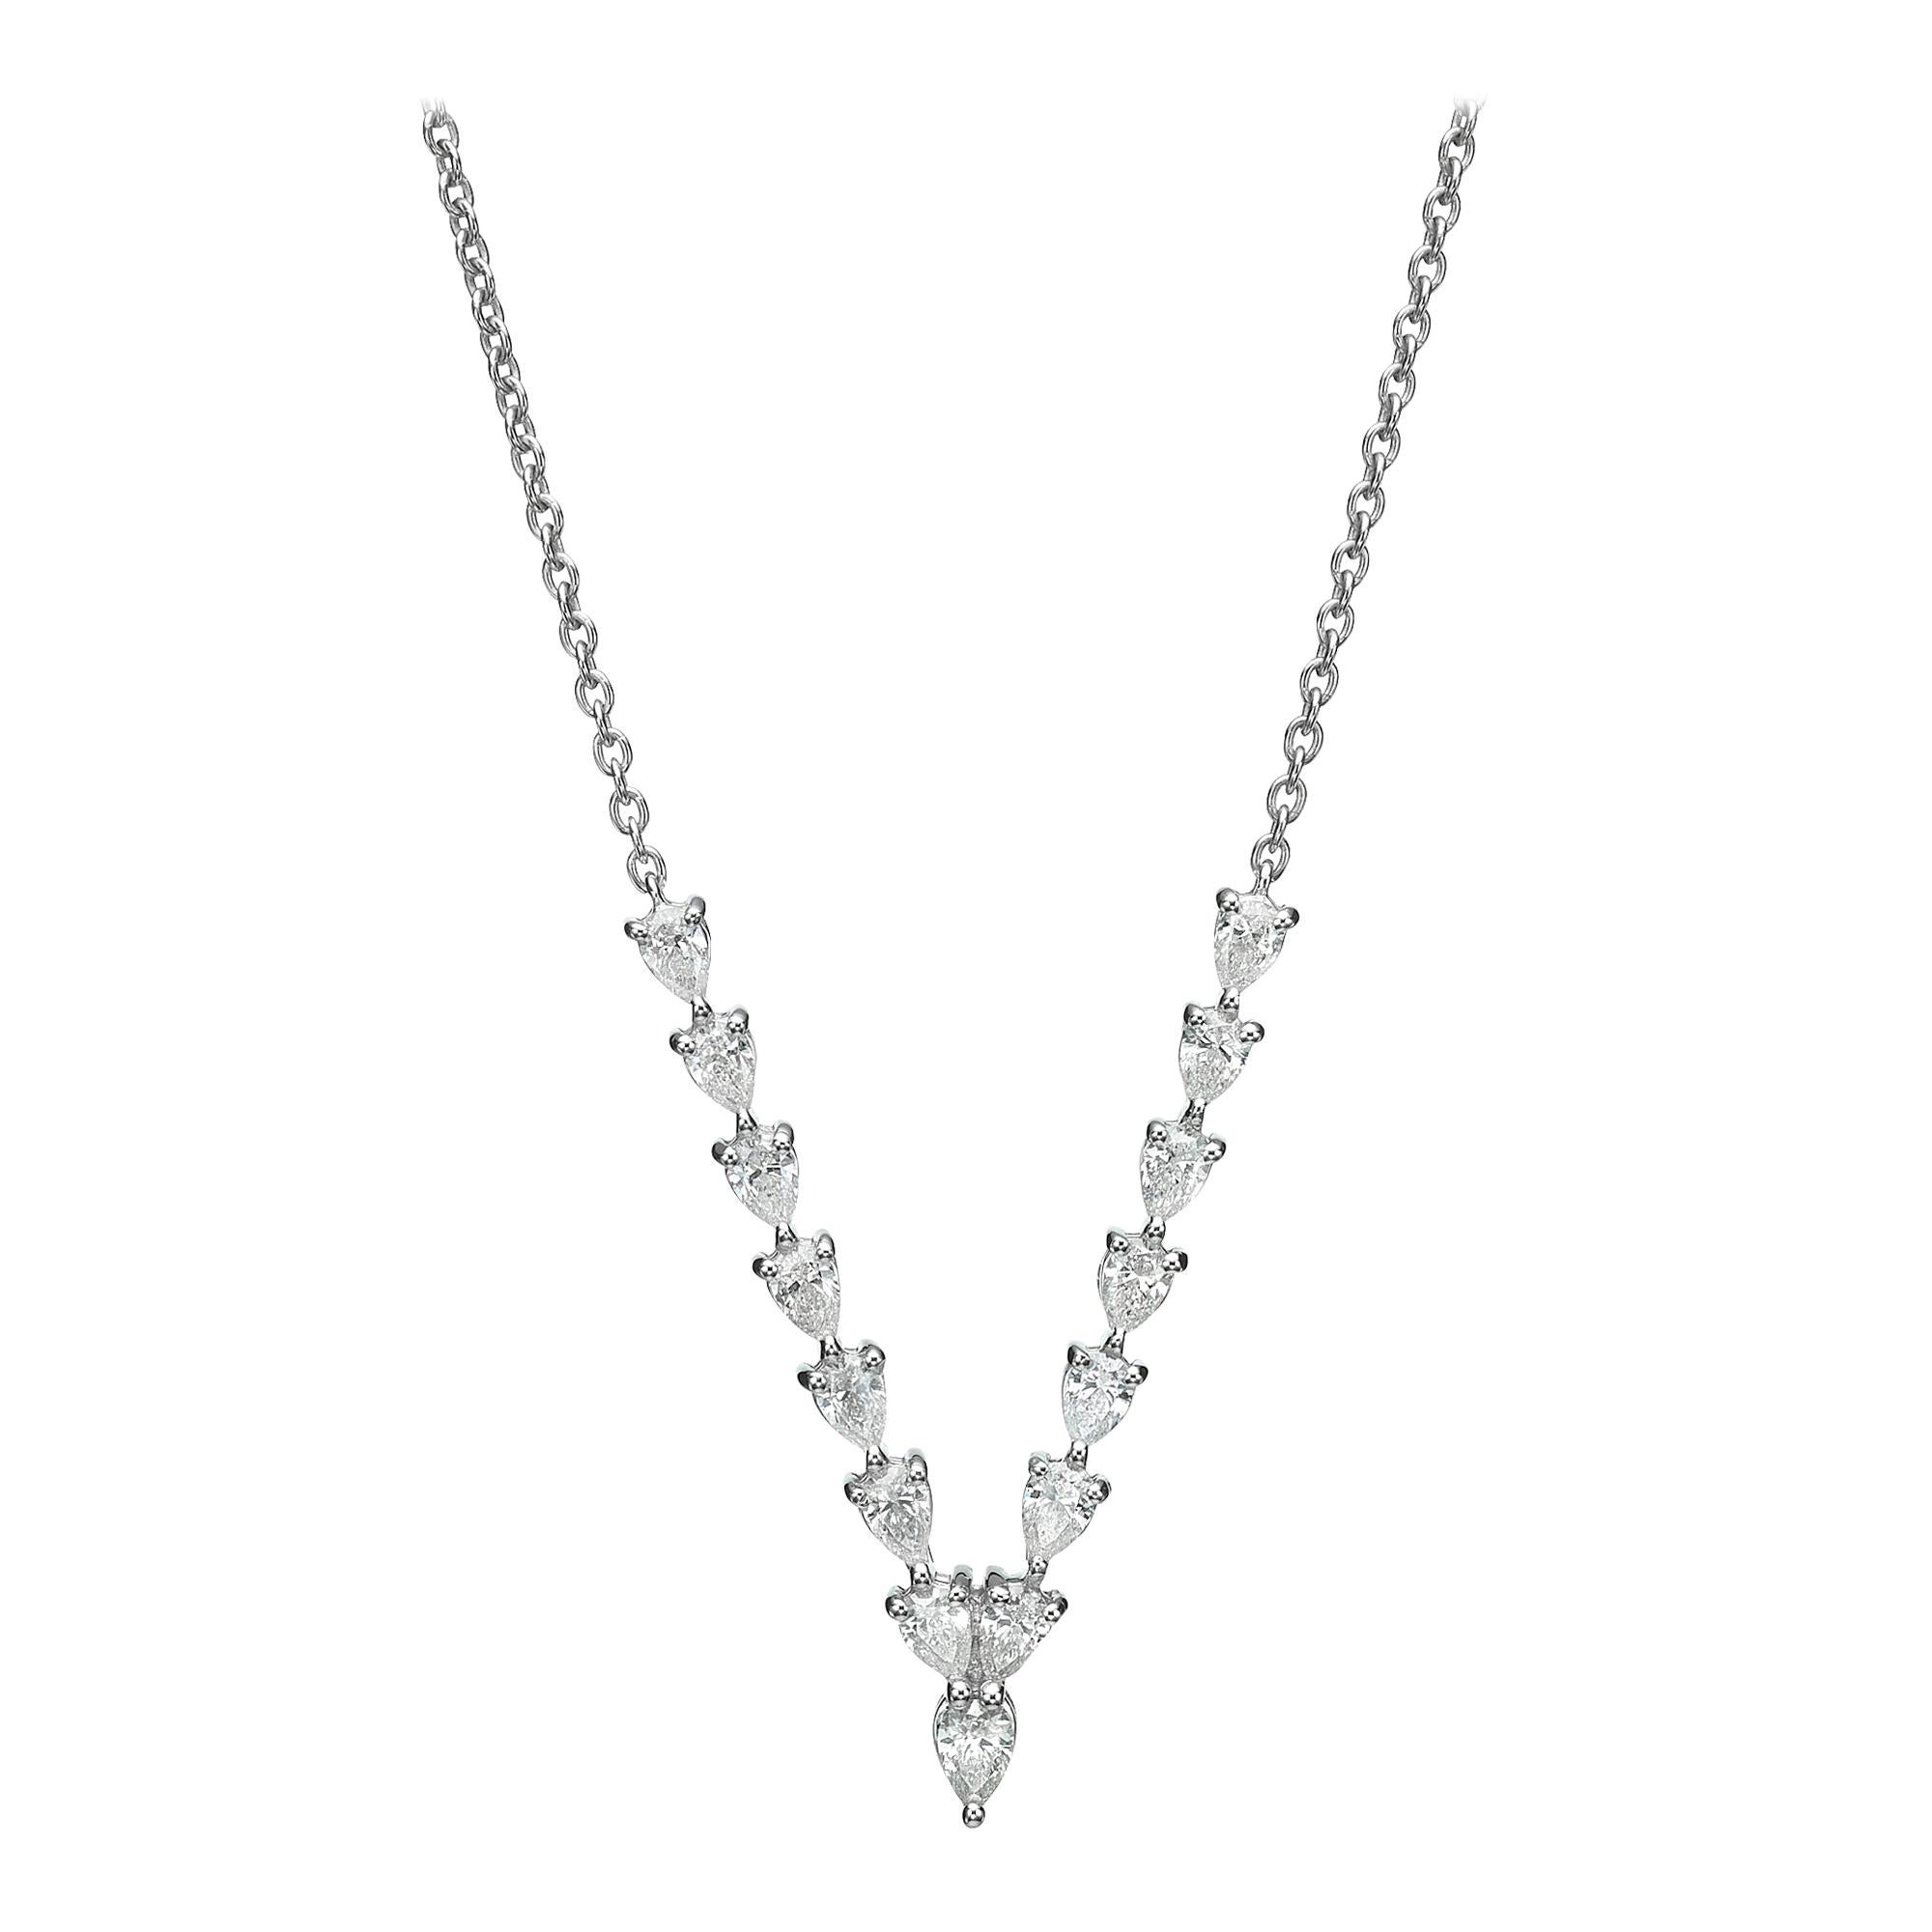 18 Karat Gold, 1.36 Carat, F Color, VS Clarity, V Shape Diamond Pendant Necklace